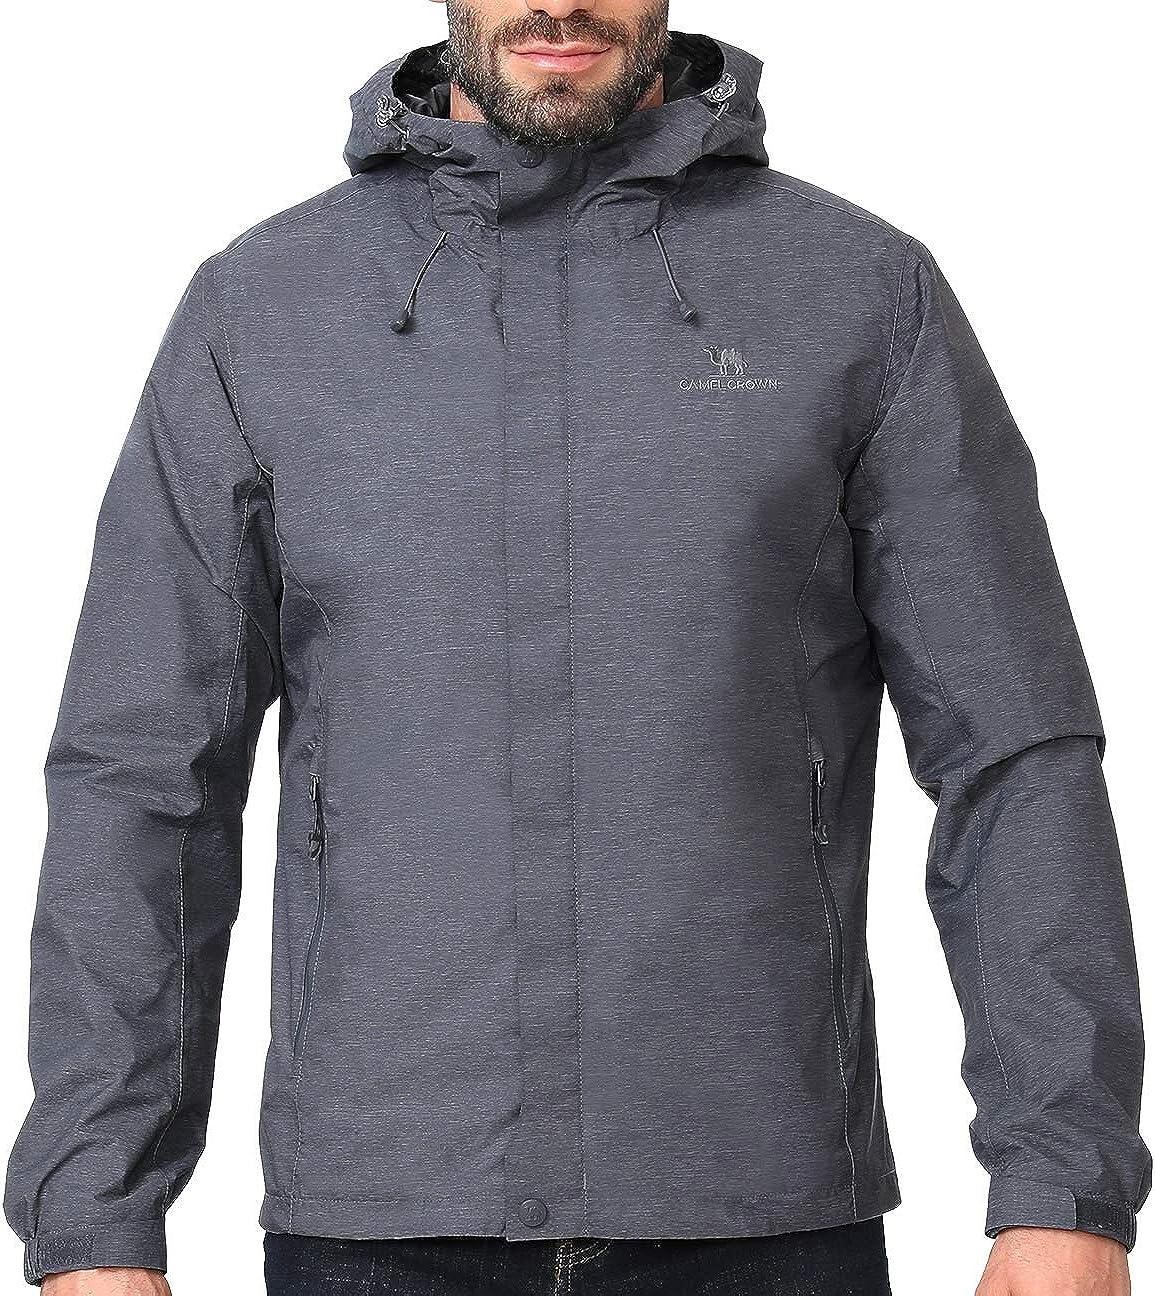 CAMEL CROWN Mens Waterproof Jacket Hooded Windbreaker Windproof Rain Coat Shell for Outdoor Hiking Climbing Traveling